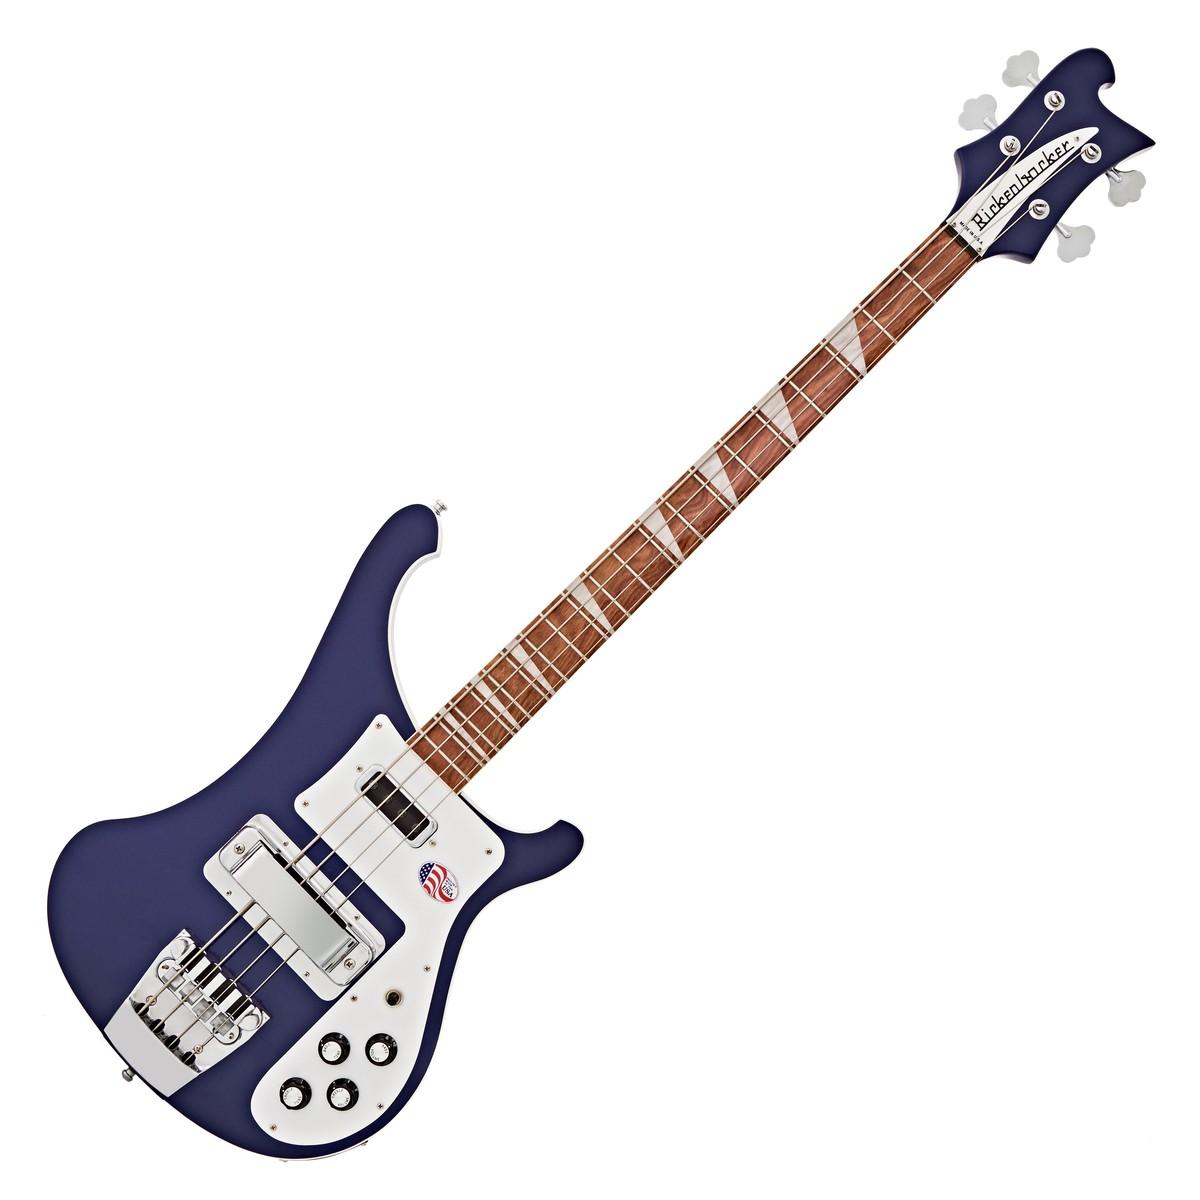 rickenbacker 4003 bass guitar midnight blue at gear4music. Black Bedroom Furniture Sets. Home Design Ideas